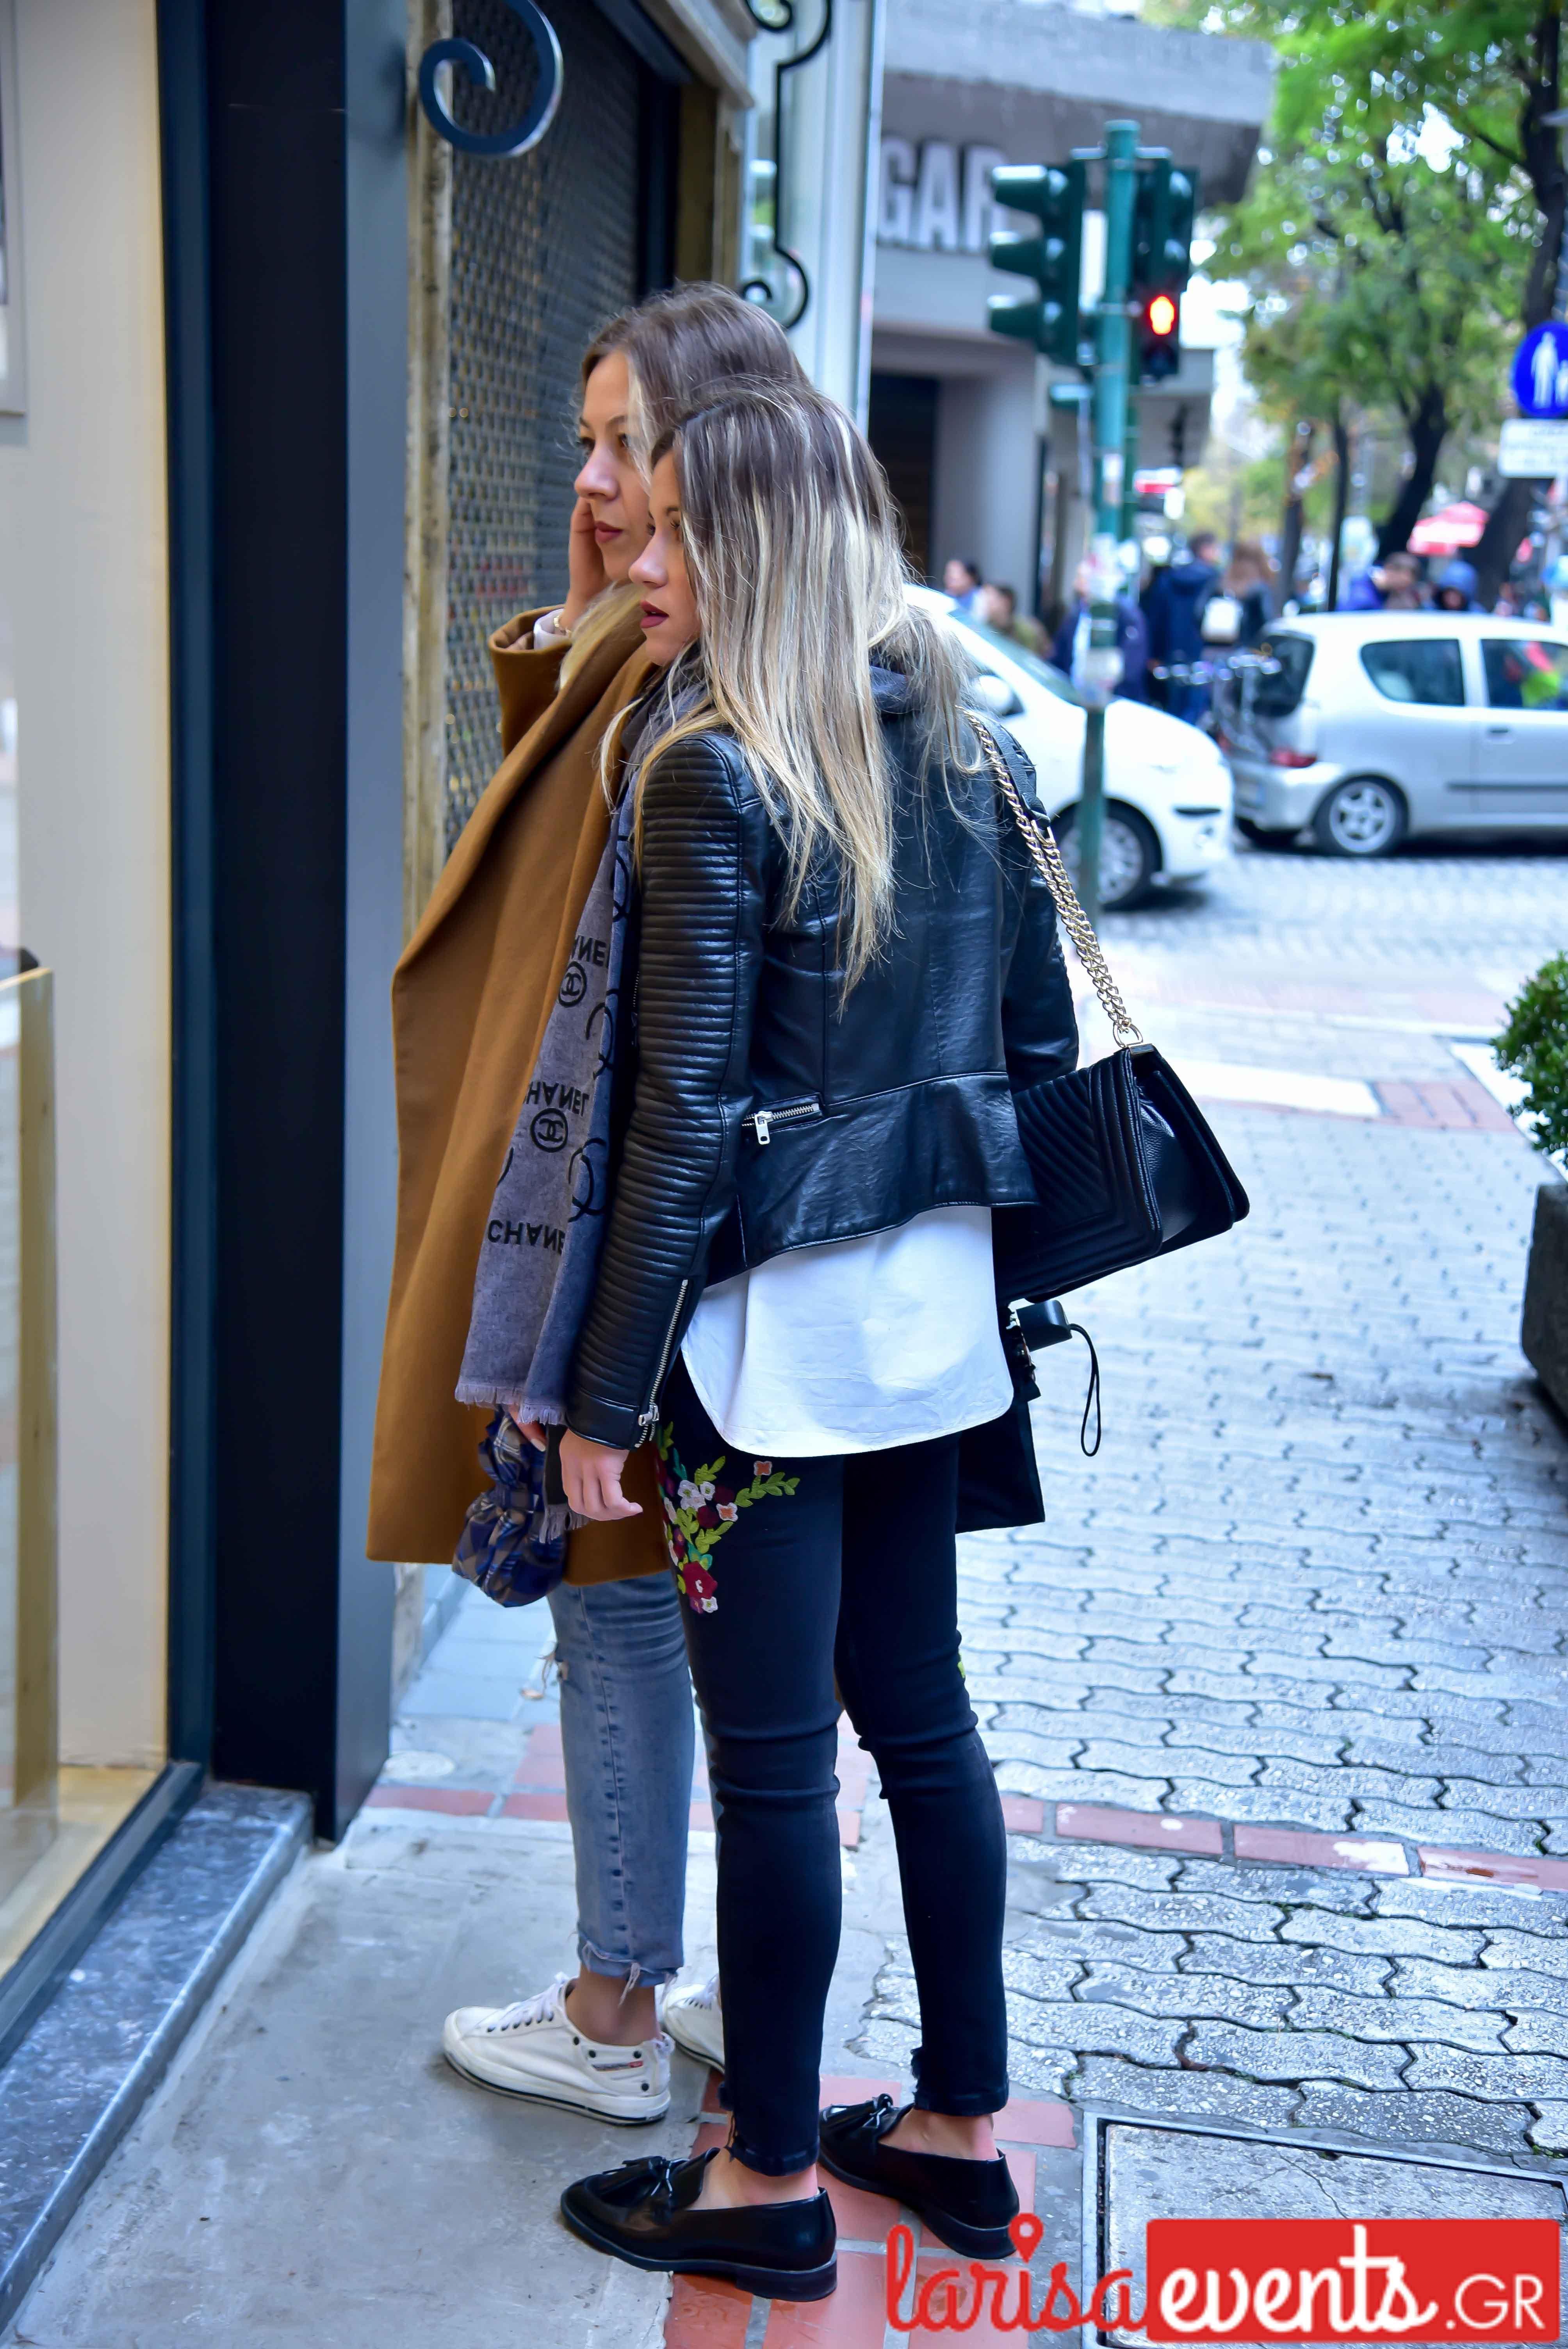 LAZ 6707 - Λάρισα's Street Style | Οι Λαρισαίοι σε street style clicks!